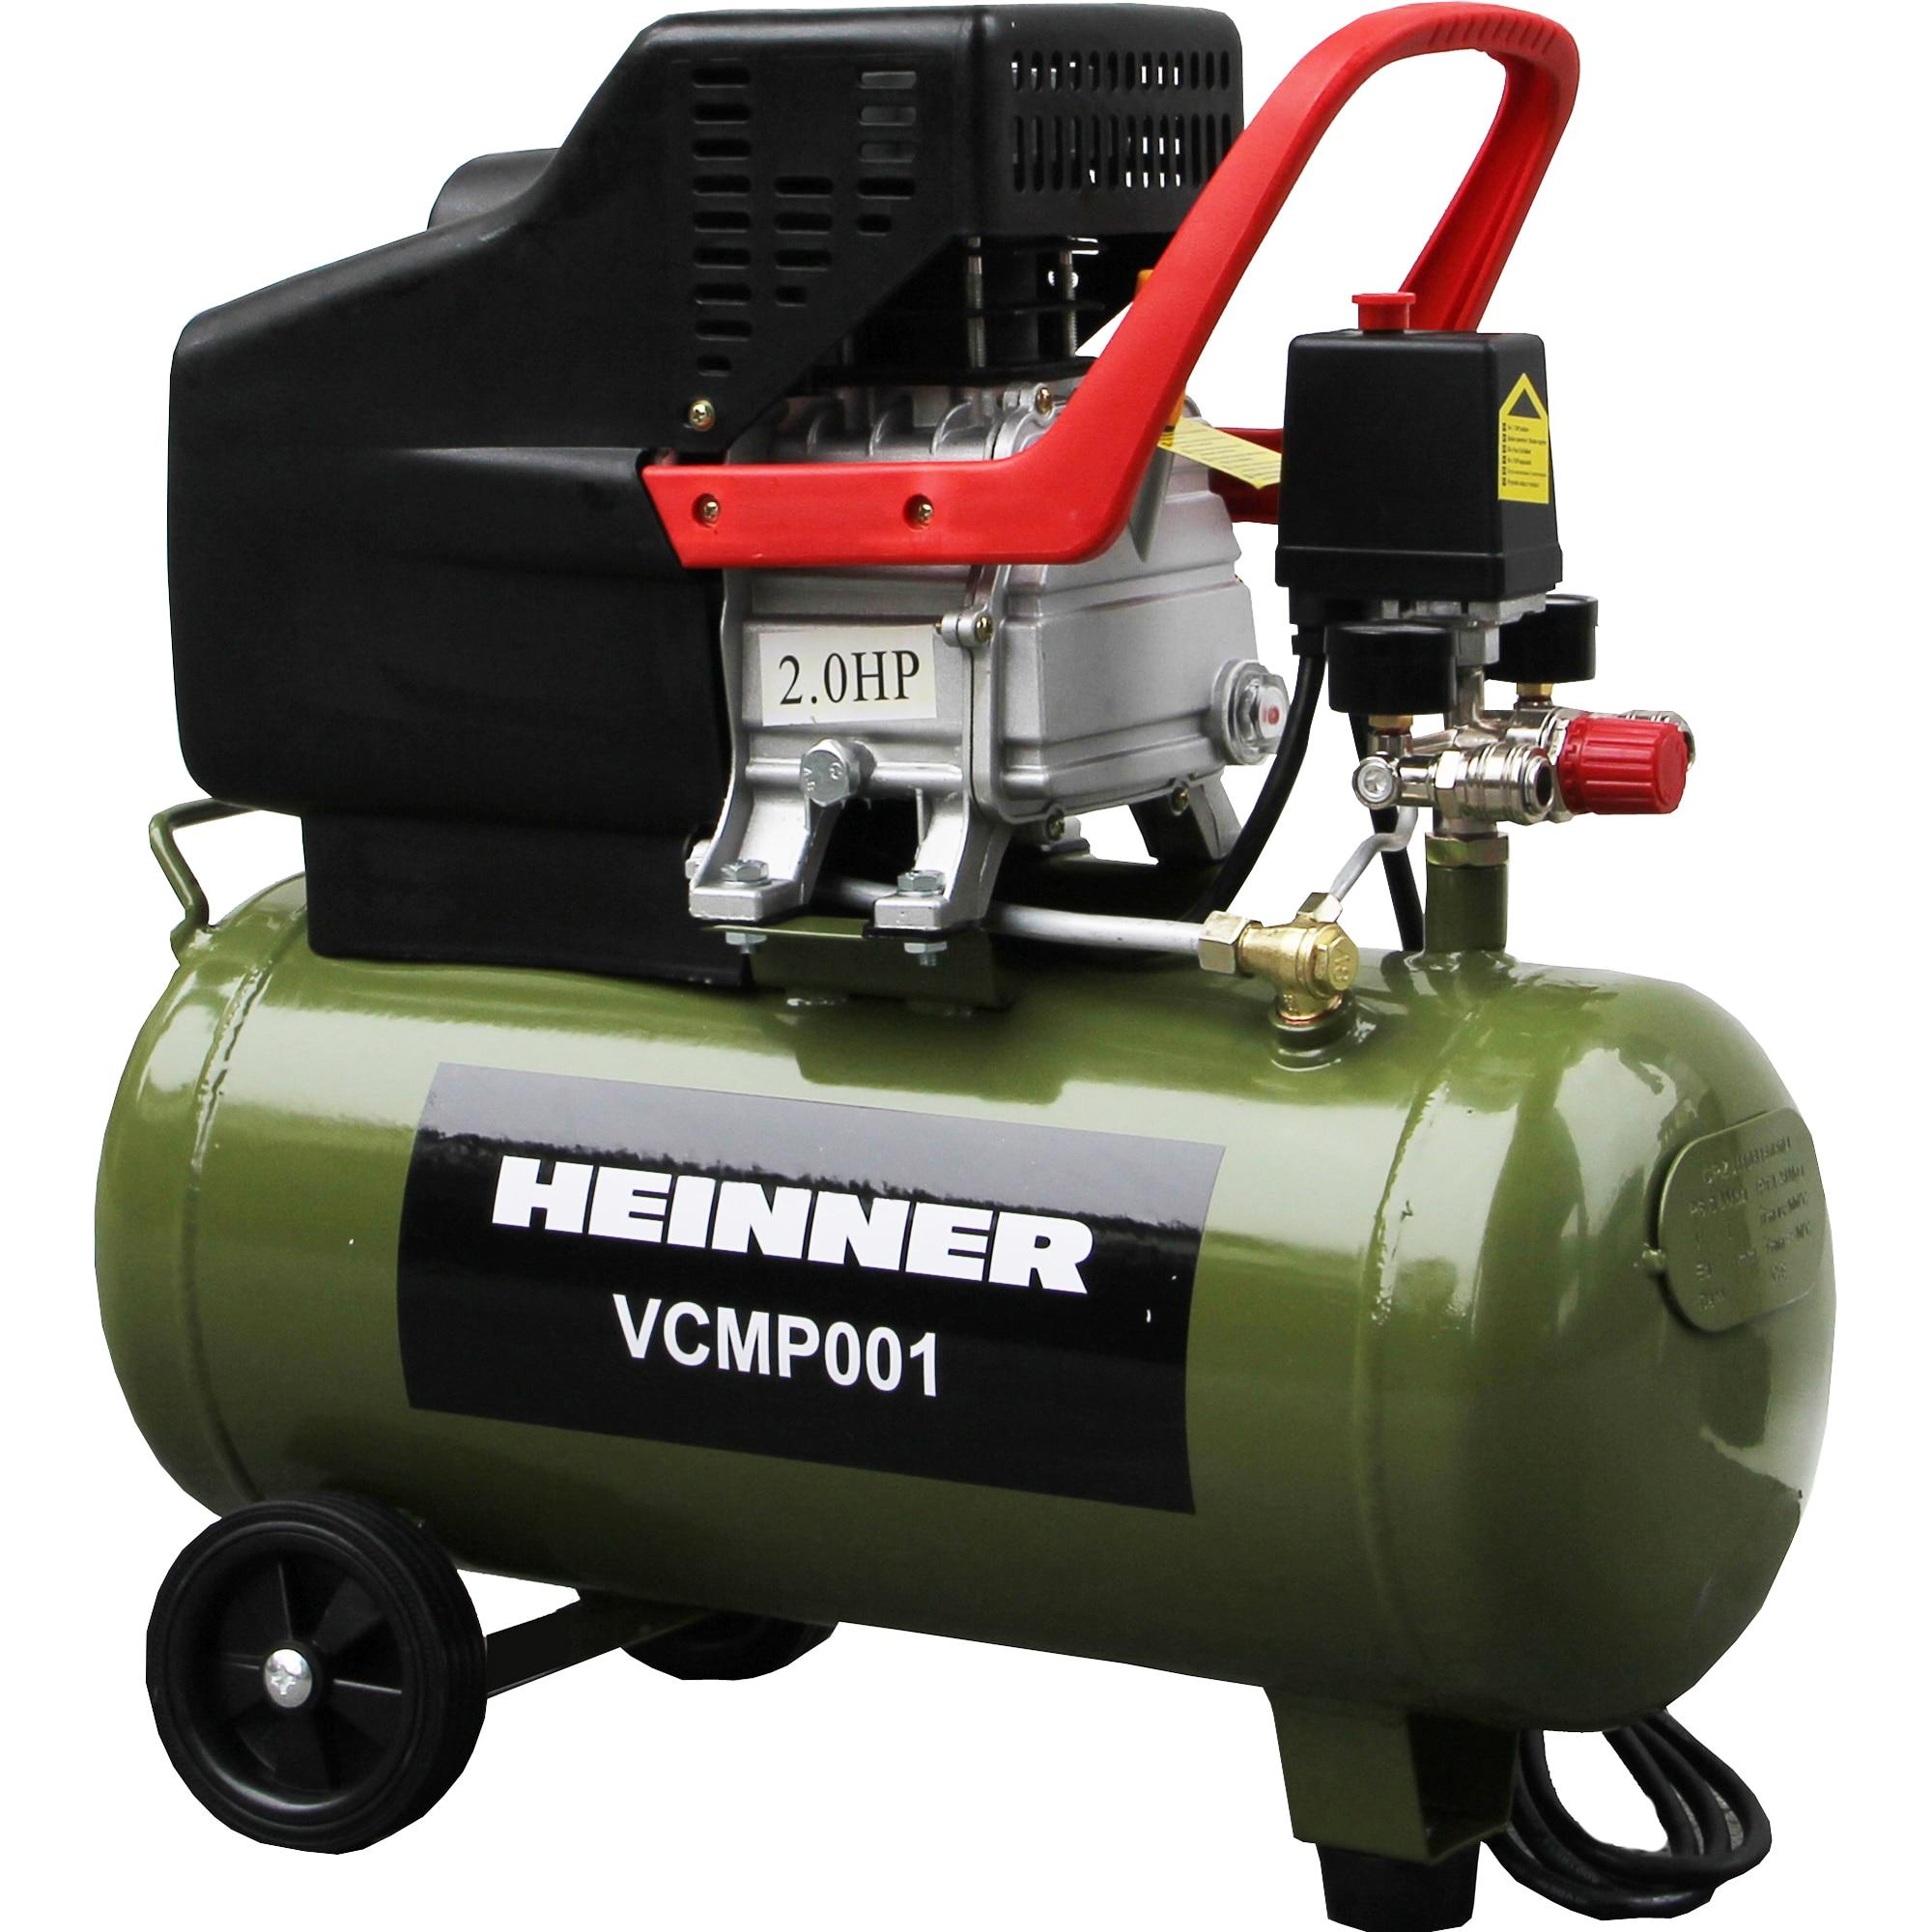 Fotografie Compresor Heinner VCMP001, 2 CP, 24 l capacitate rezervor, 8 bar presiune maxima, 224 l/min debit aer refulat